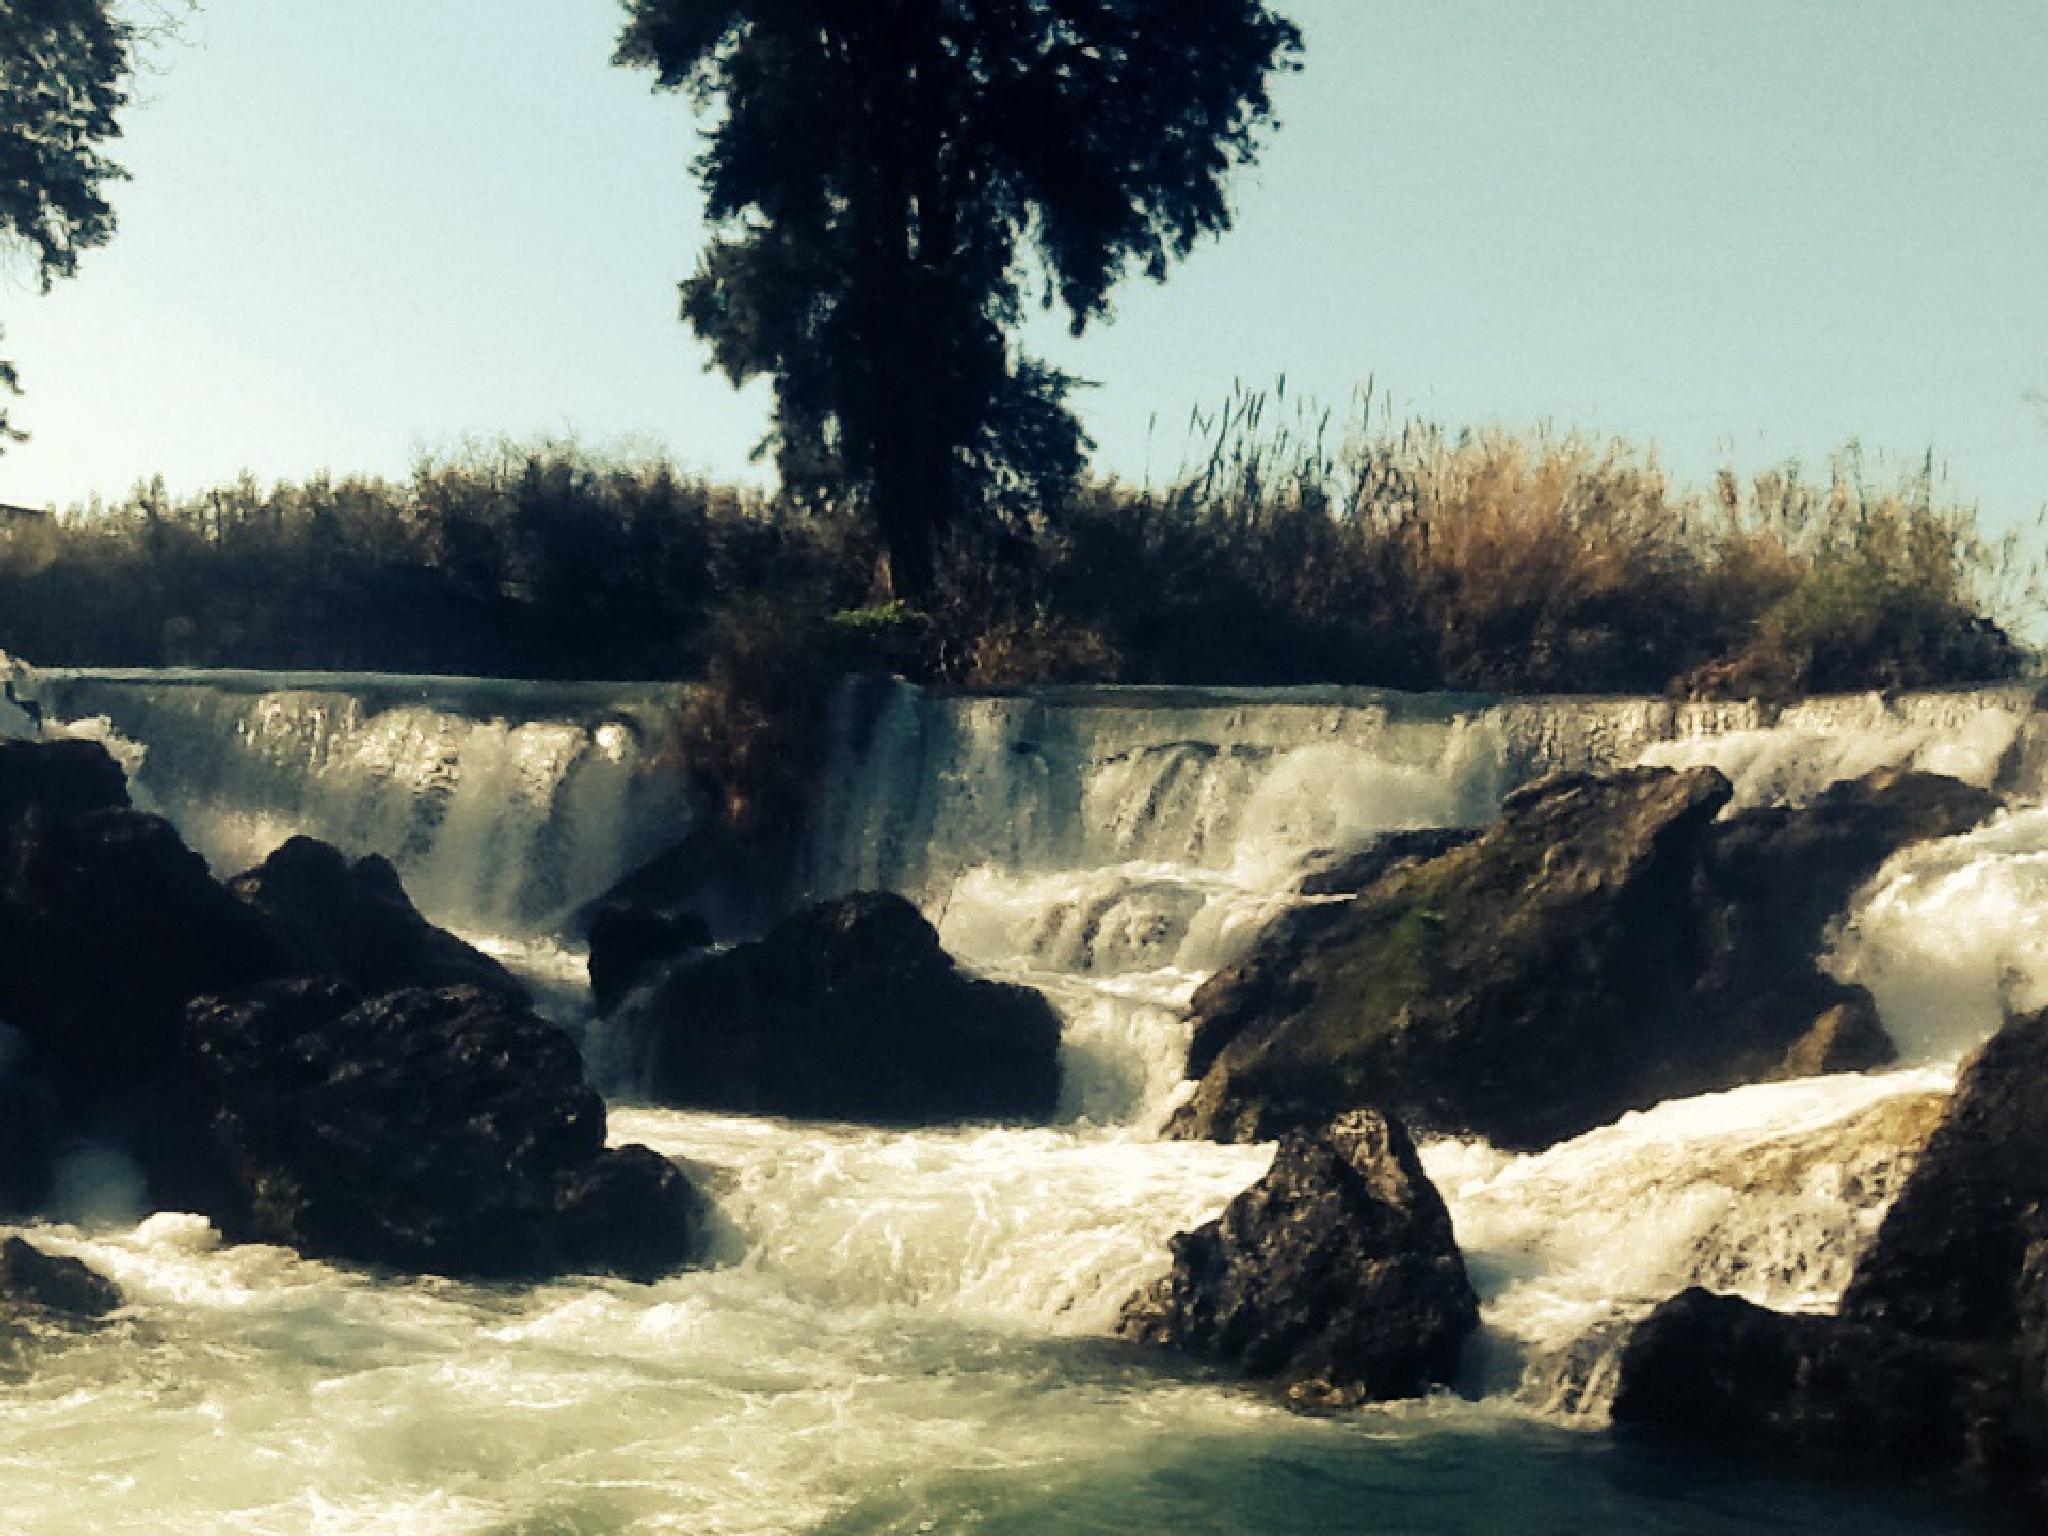 Waterfall in Tarsus by Meriç Aksu